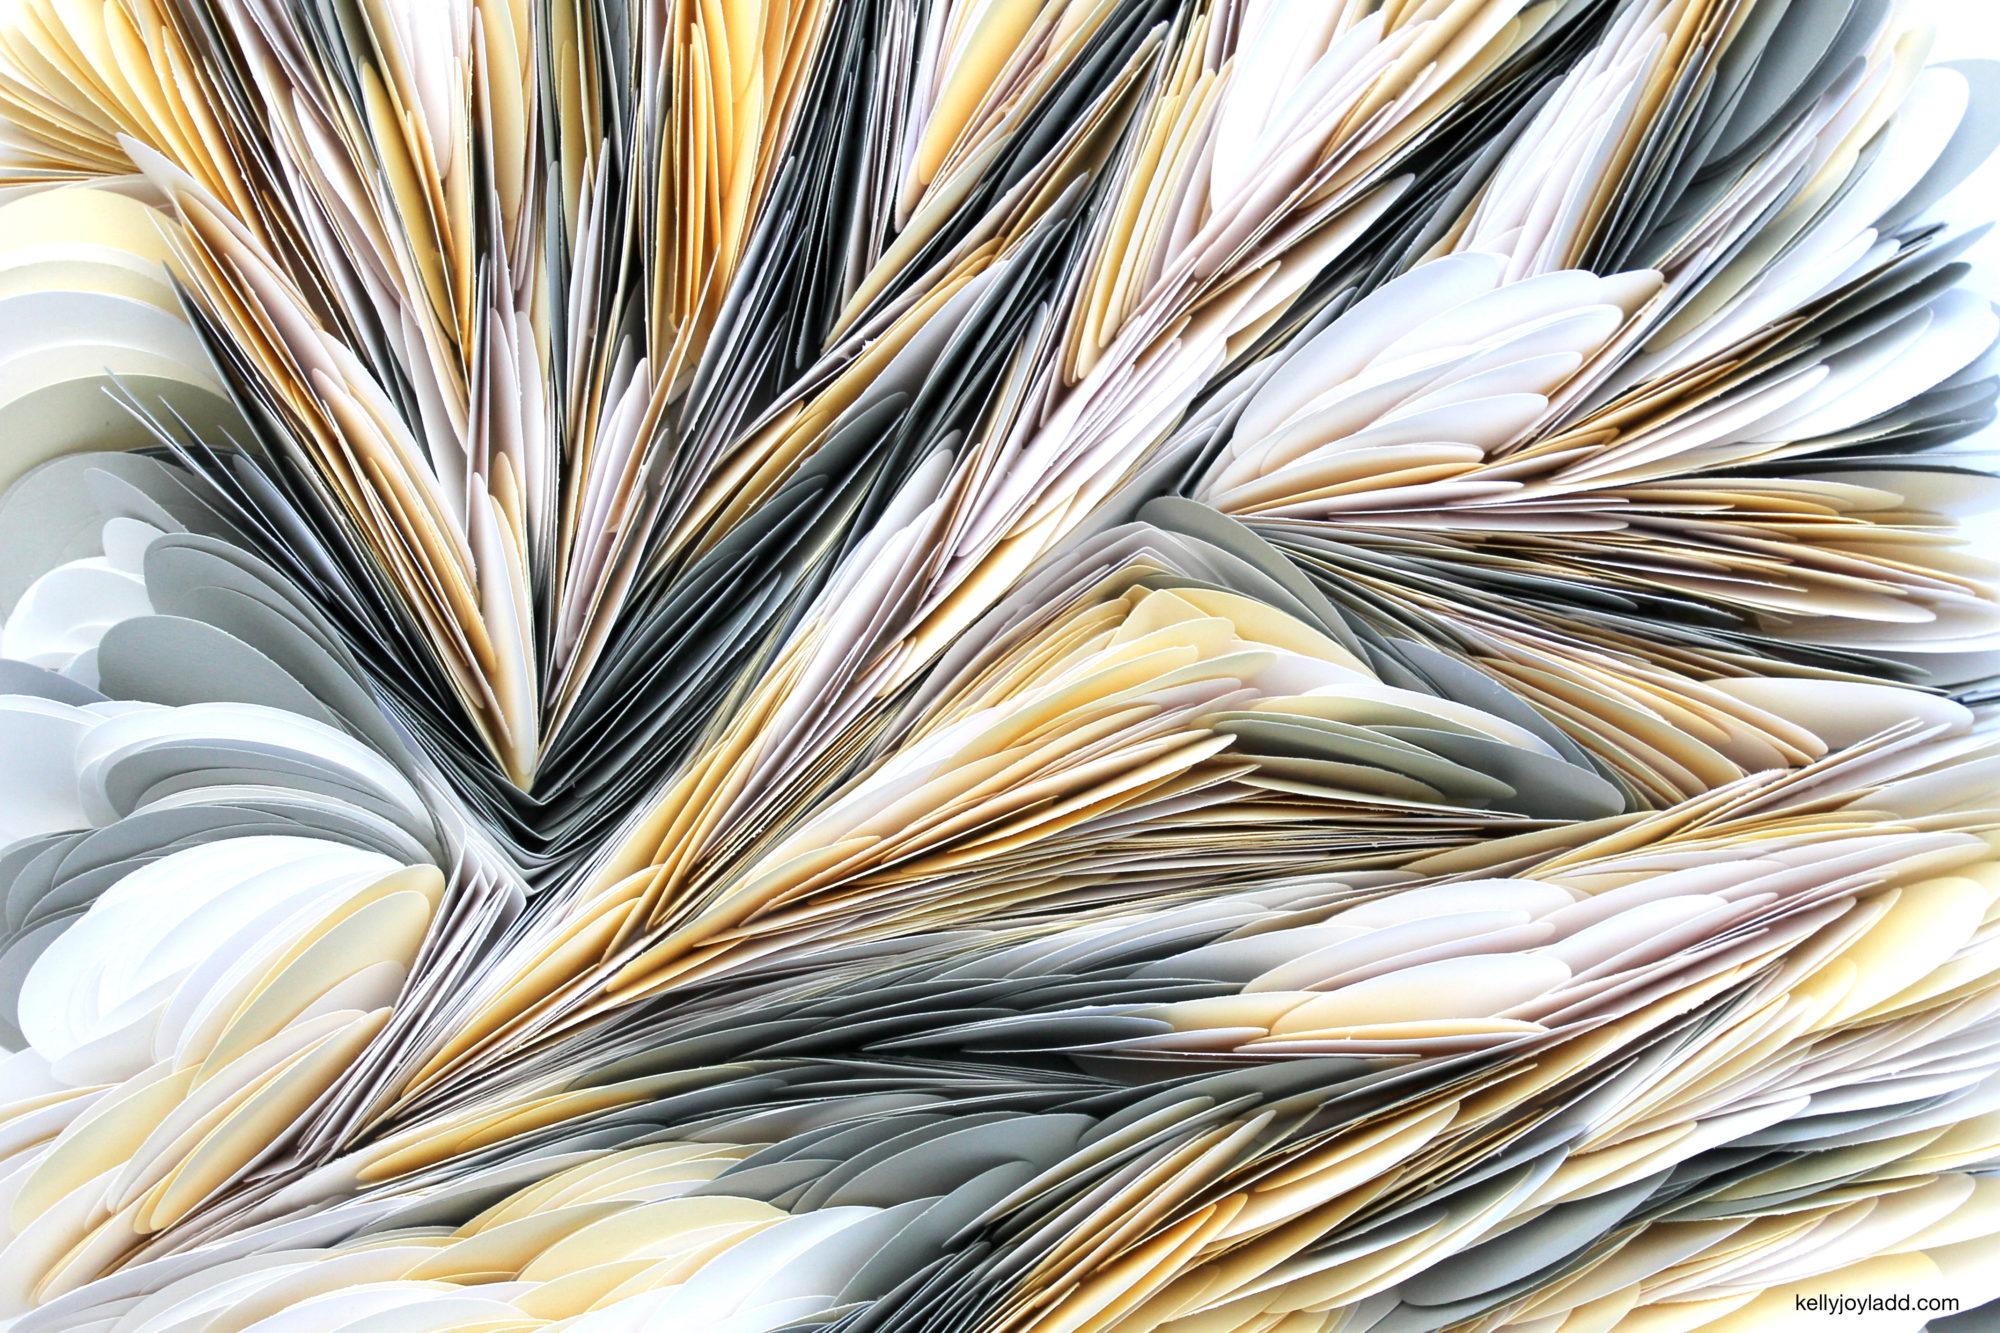 kellyjoyladd-com-layered-nuetralsimg_5812-copy